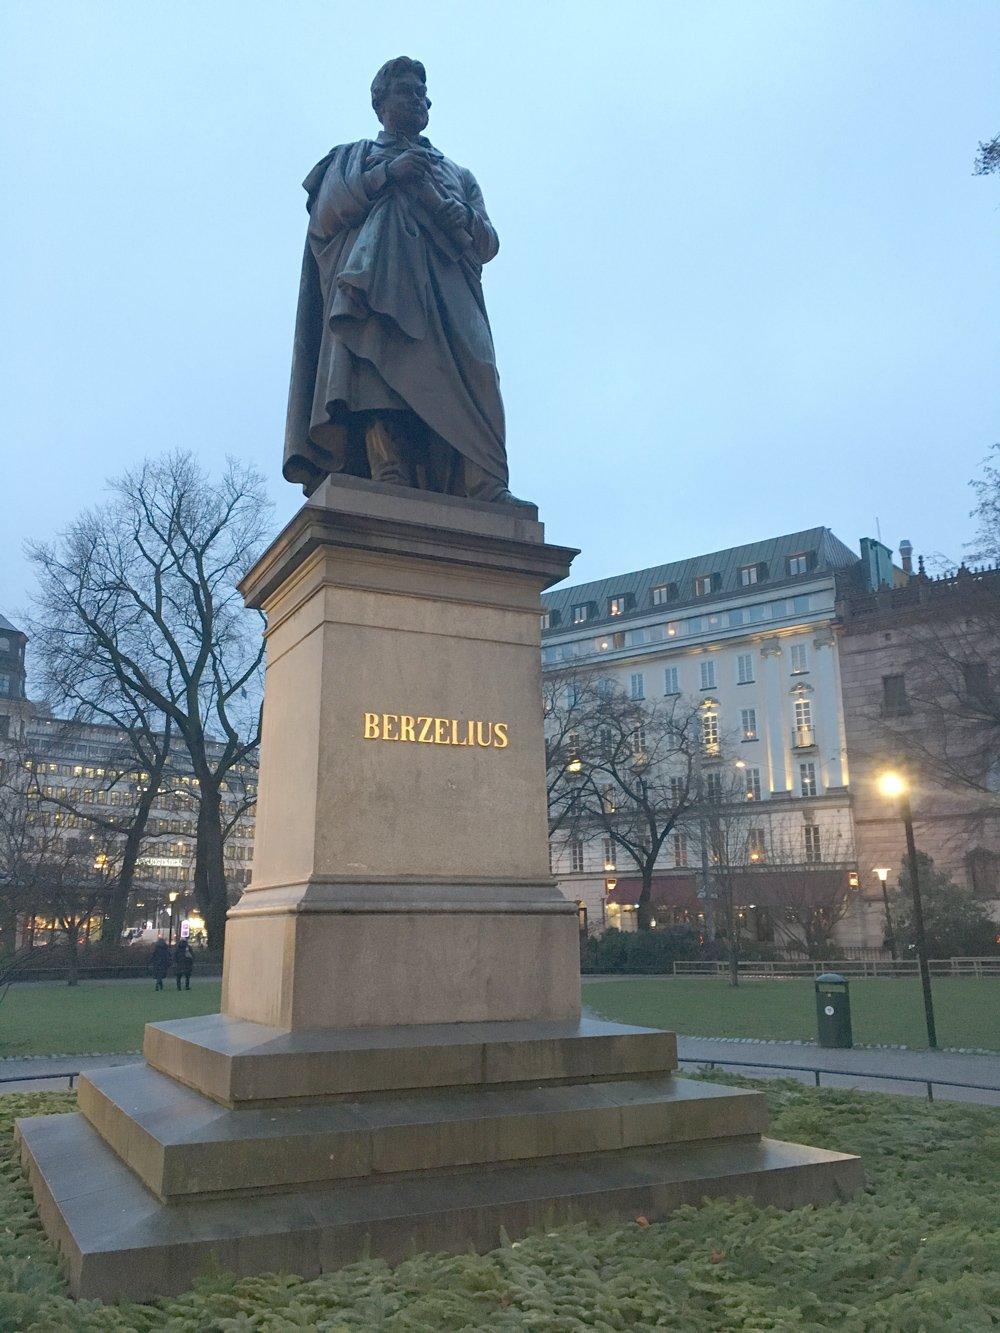 Berzeilus statyn, Carl G Qvarnström, Berzeliusparken